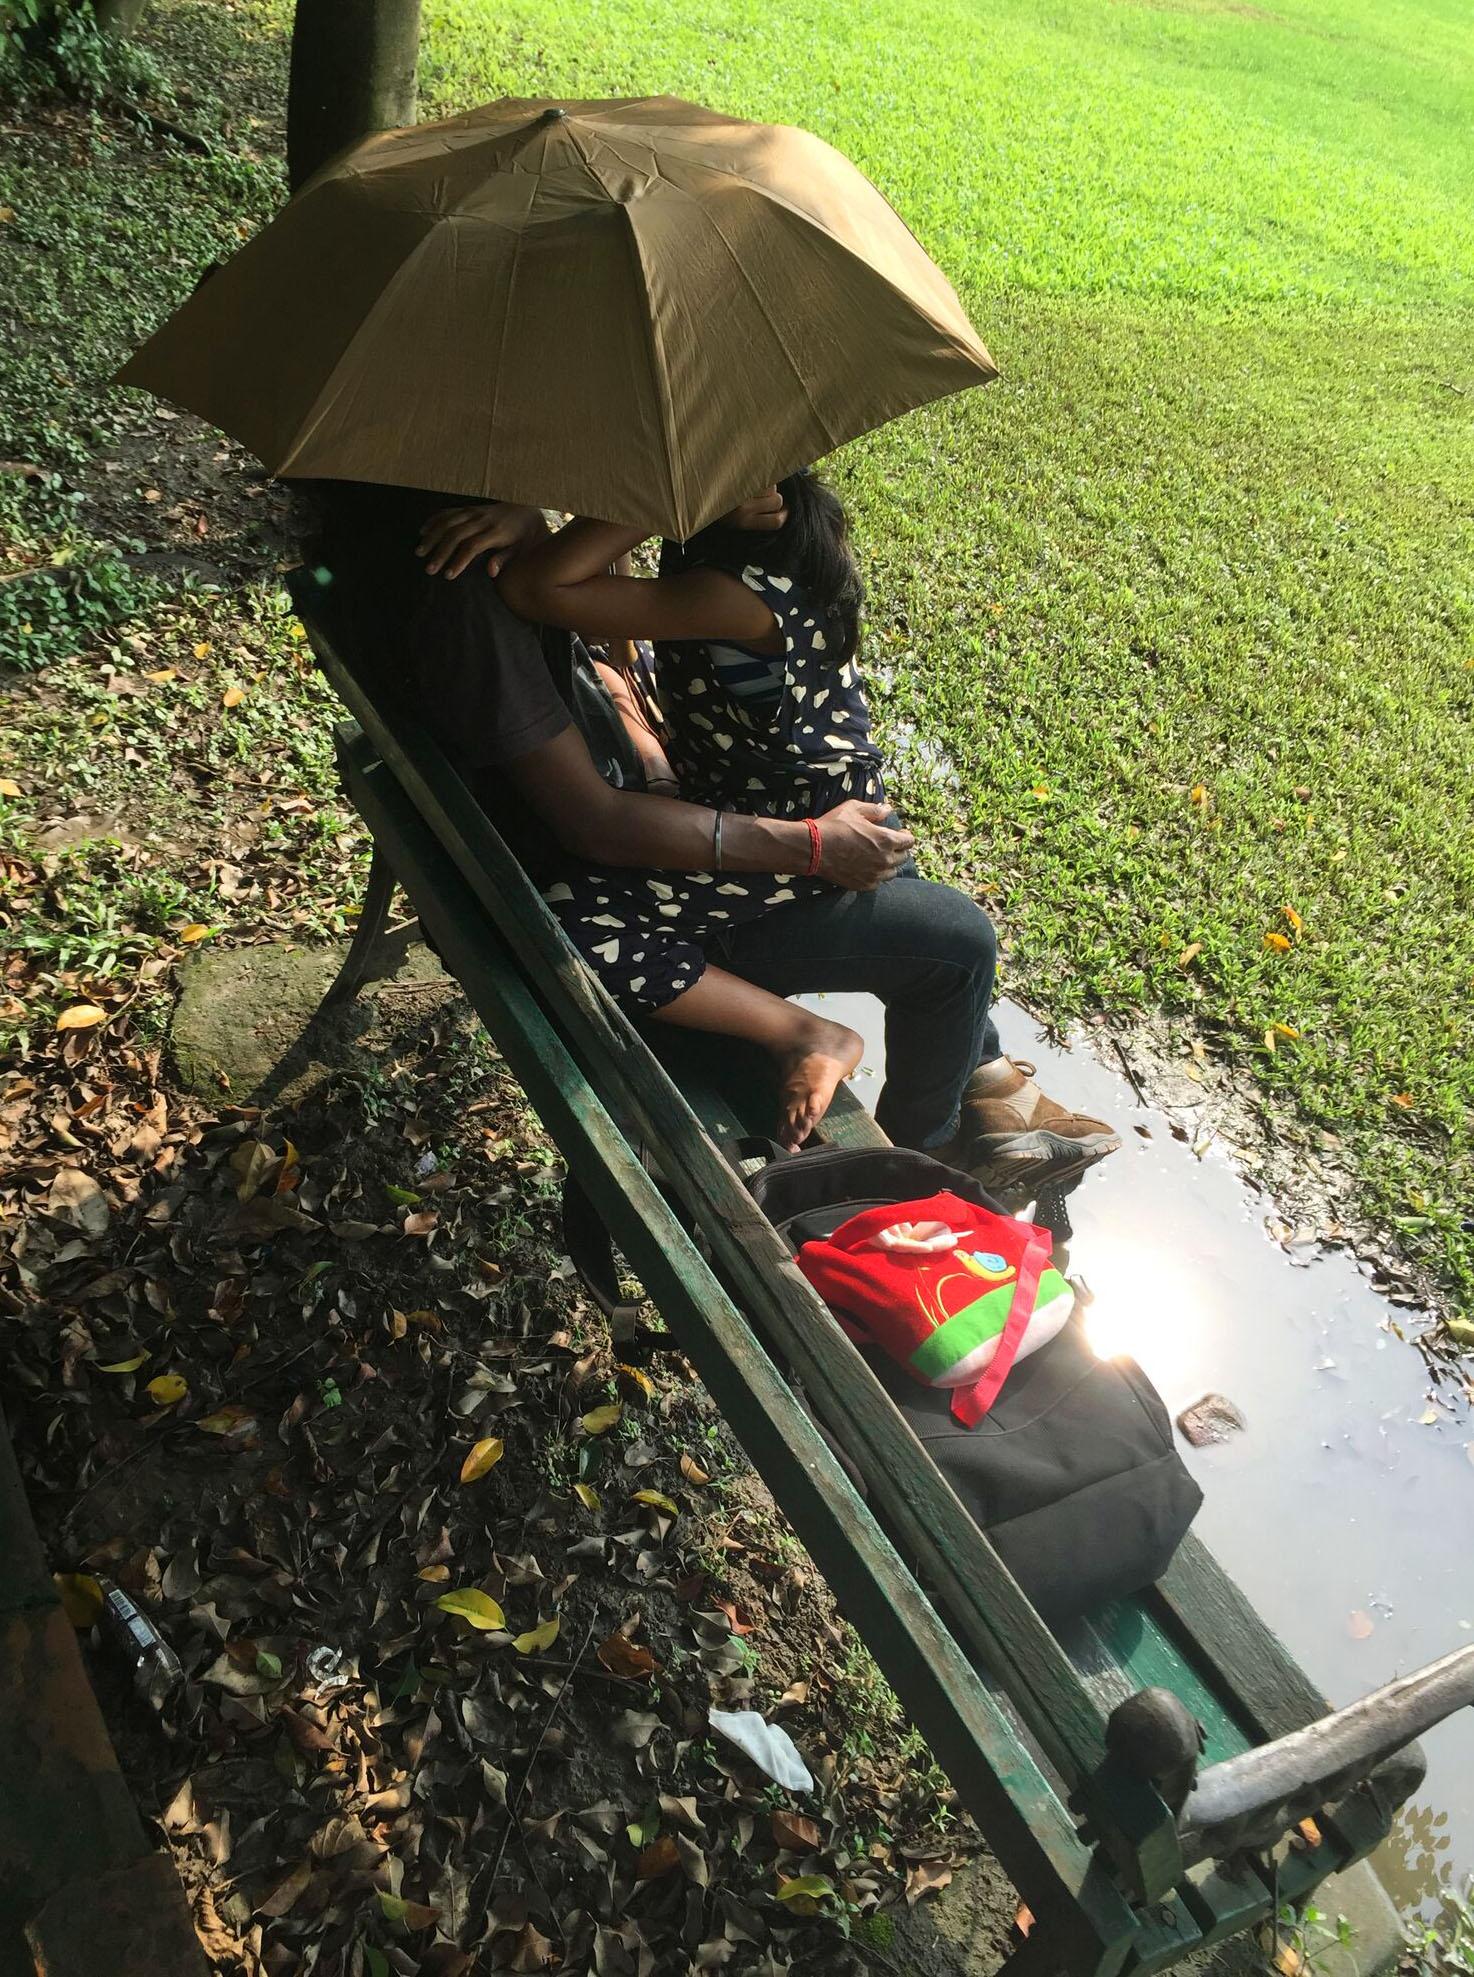 india - couple in park.jpg